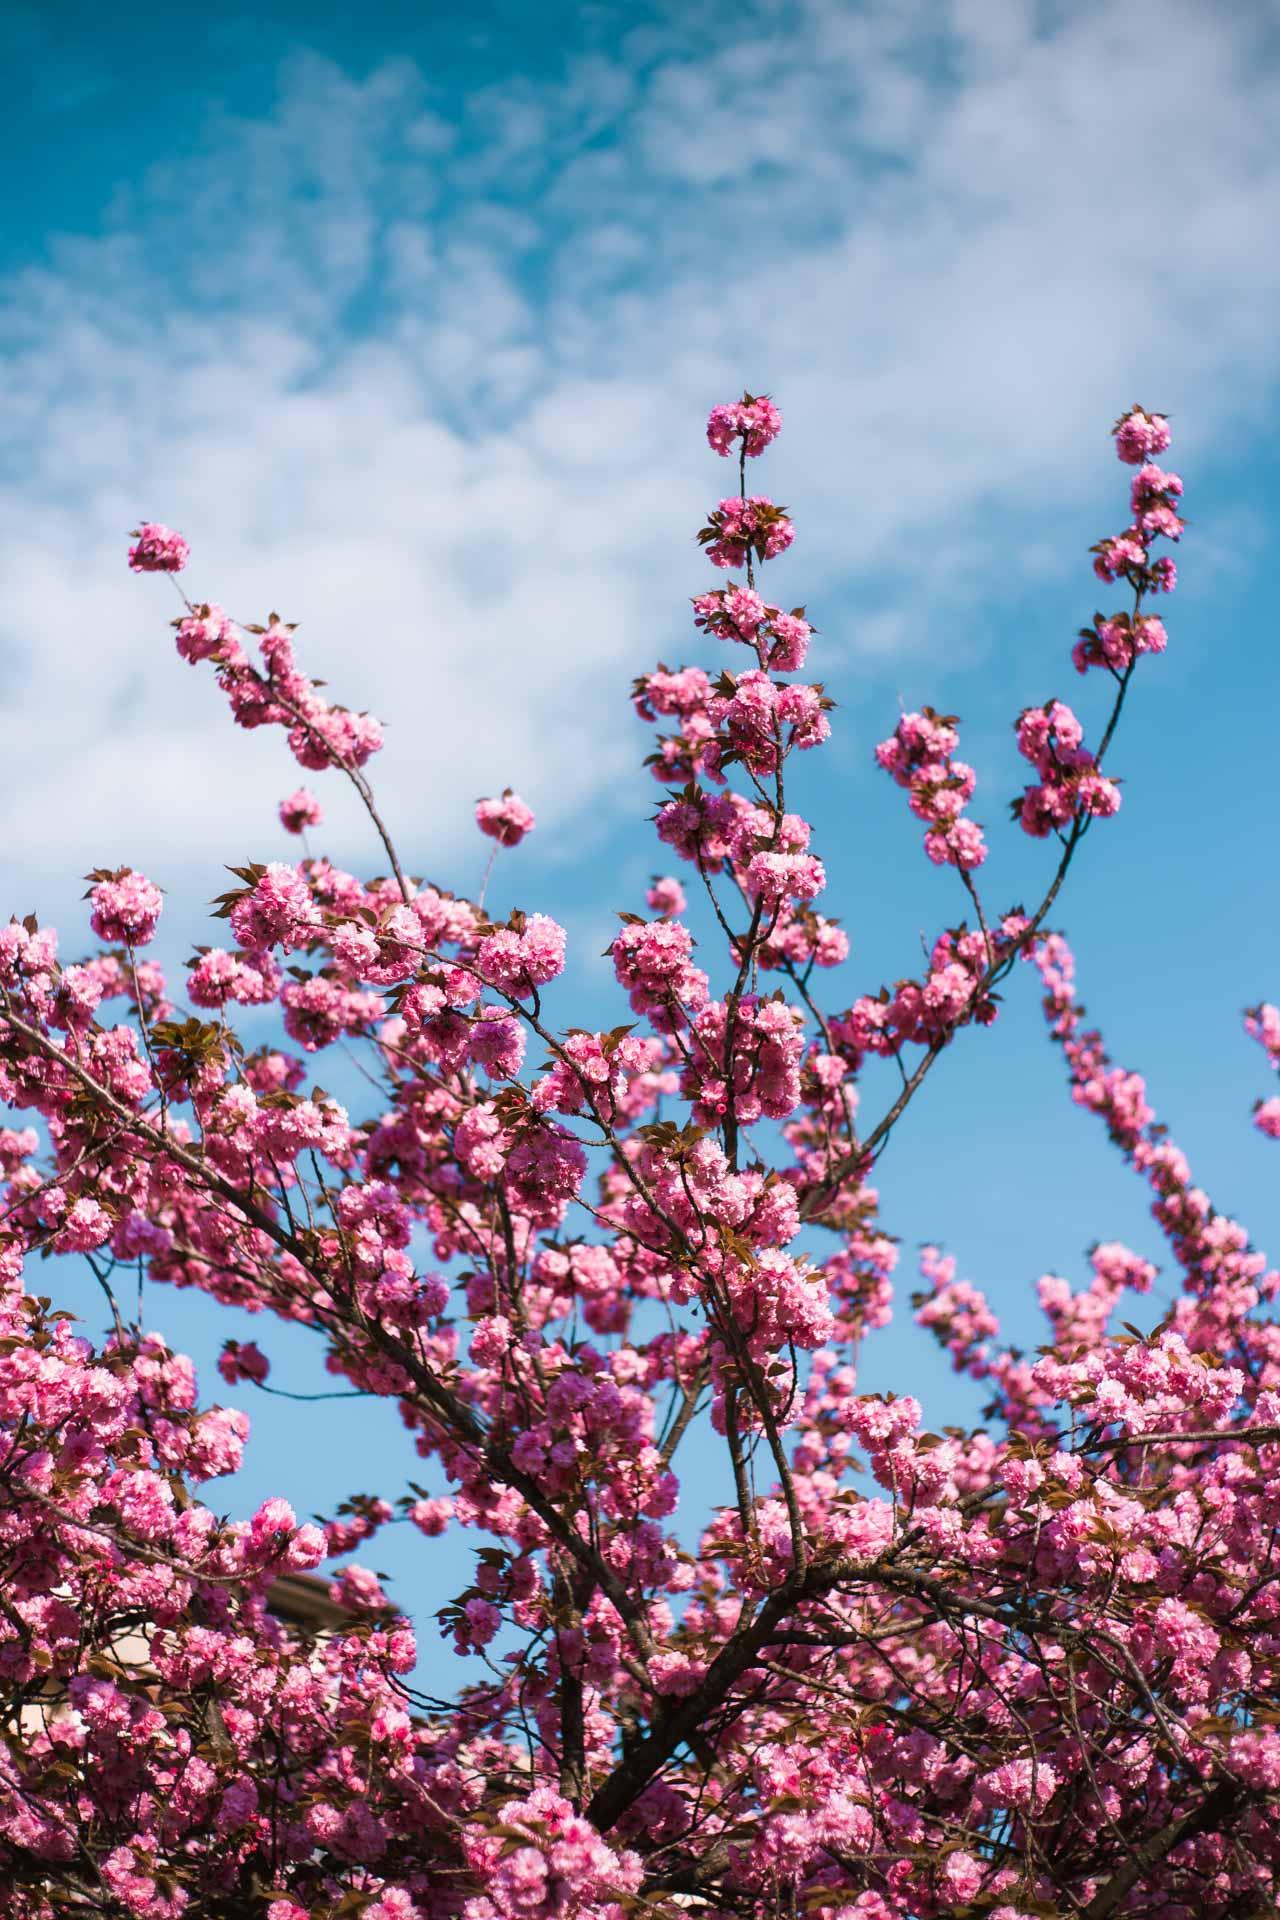 immagini di primavera bellissime